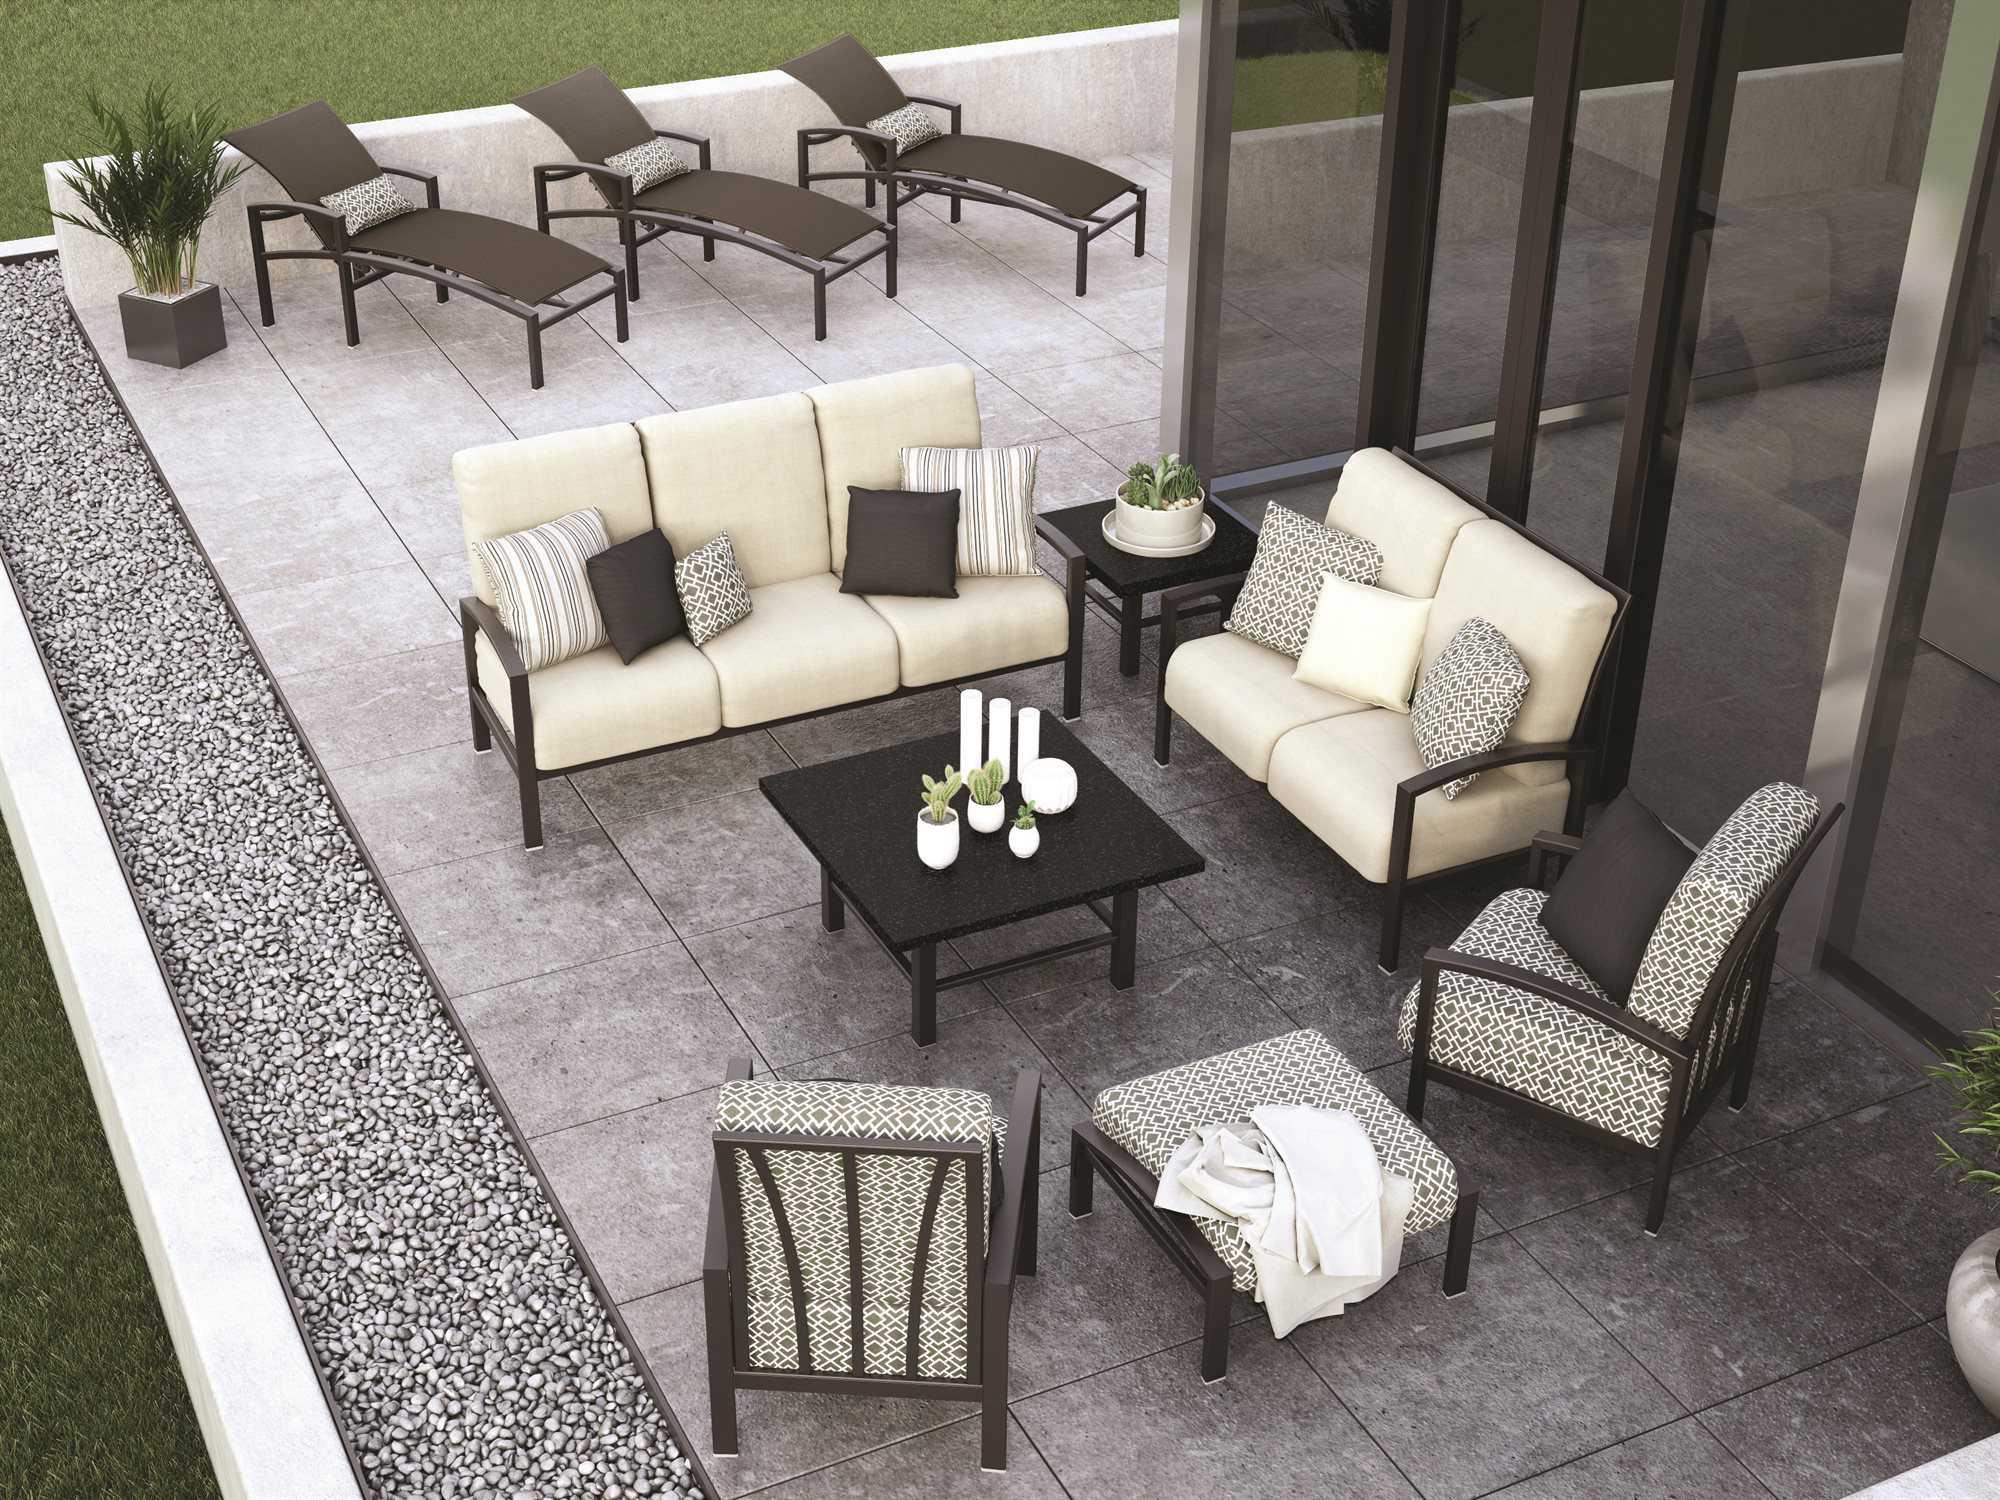 Homecrest Havenhill Cushion Aluminum Sofa 4A43B